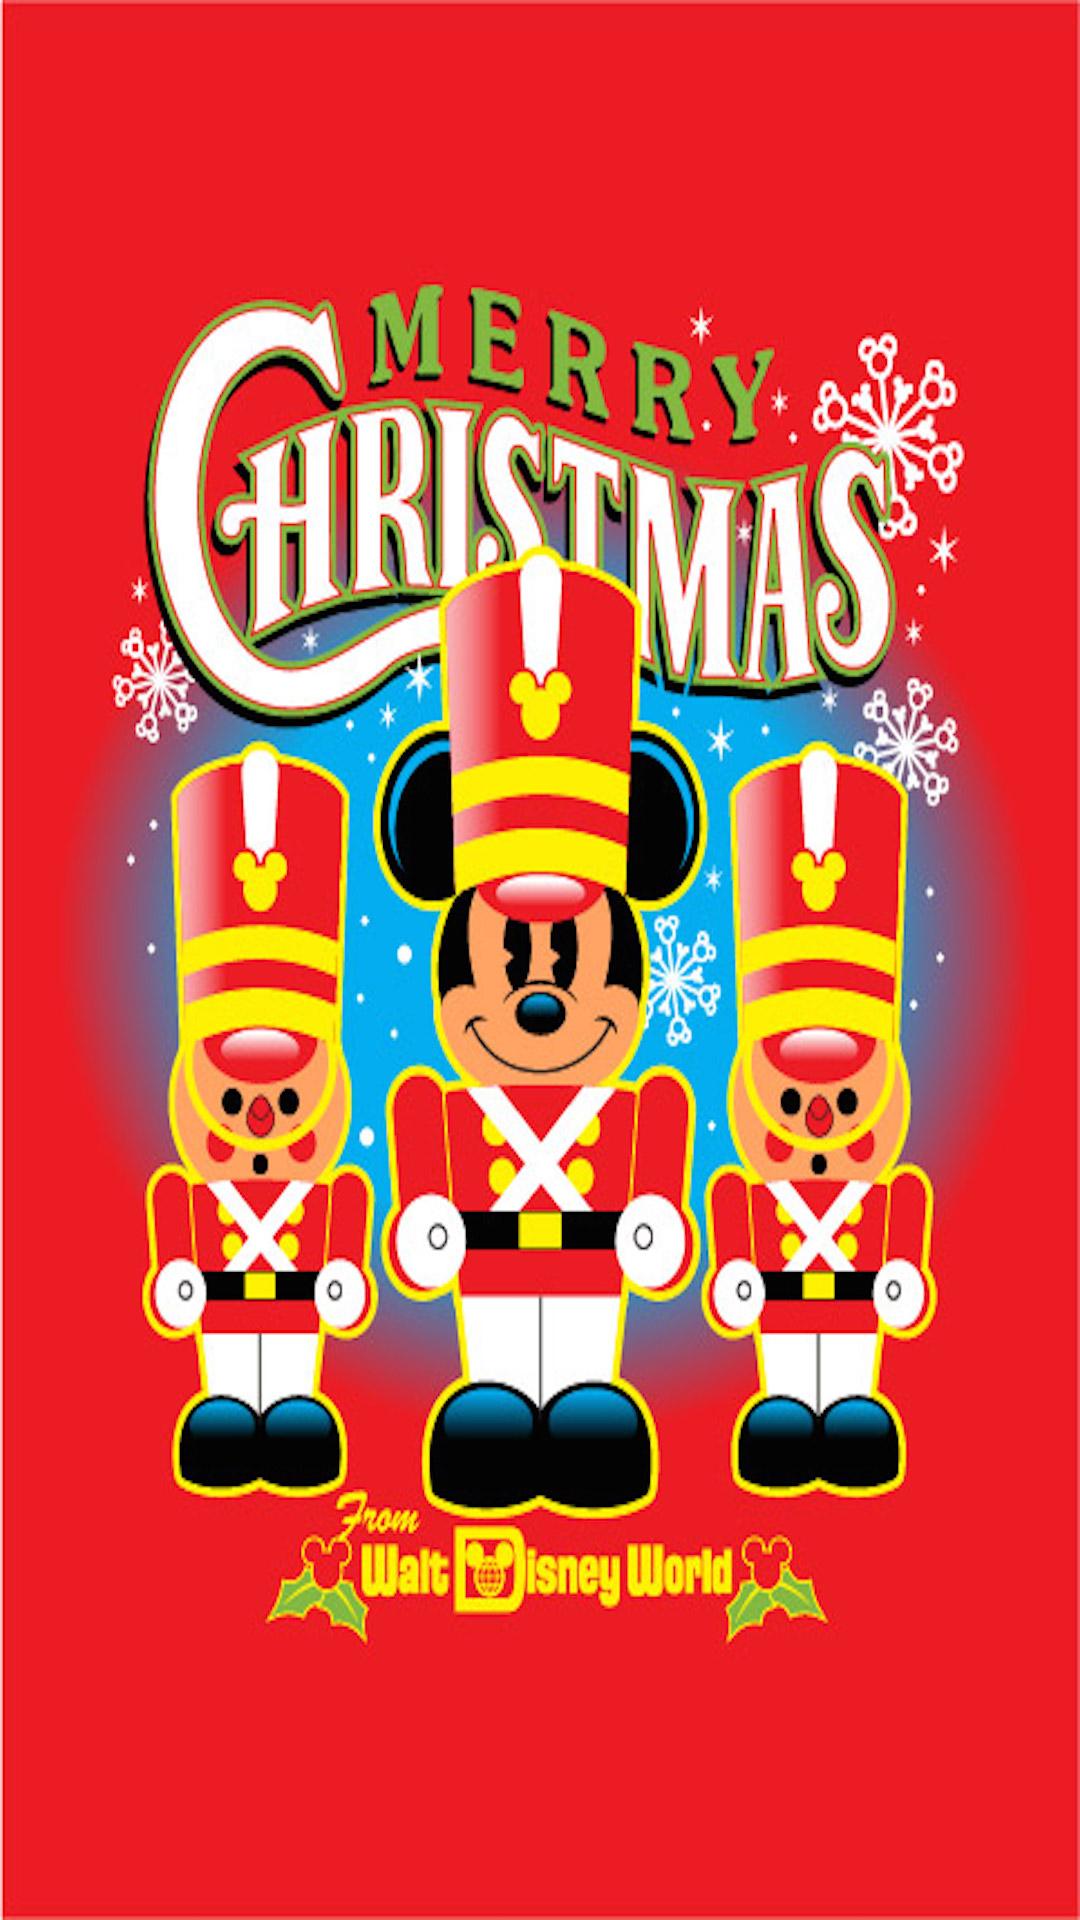 Nutcracker Mickey Mouse Christmas Phone Wallpaper